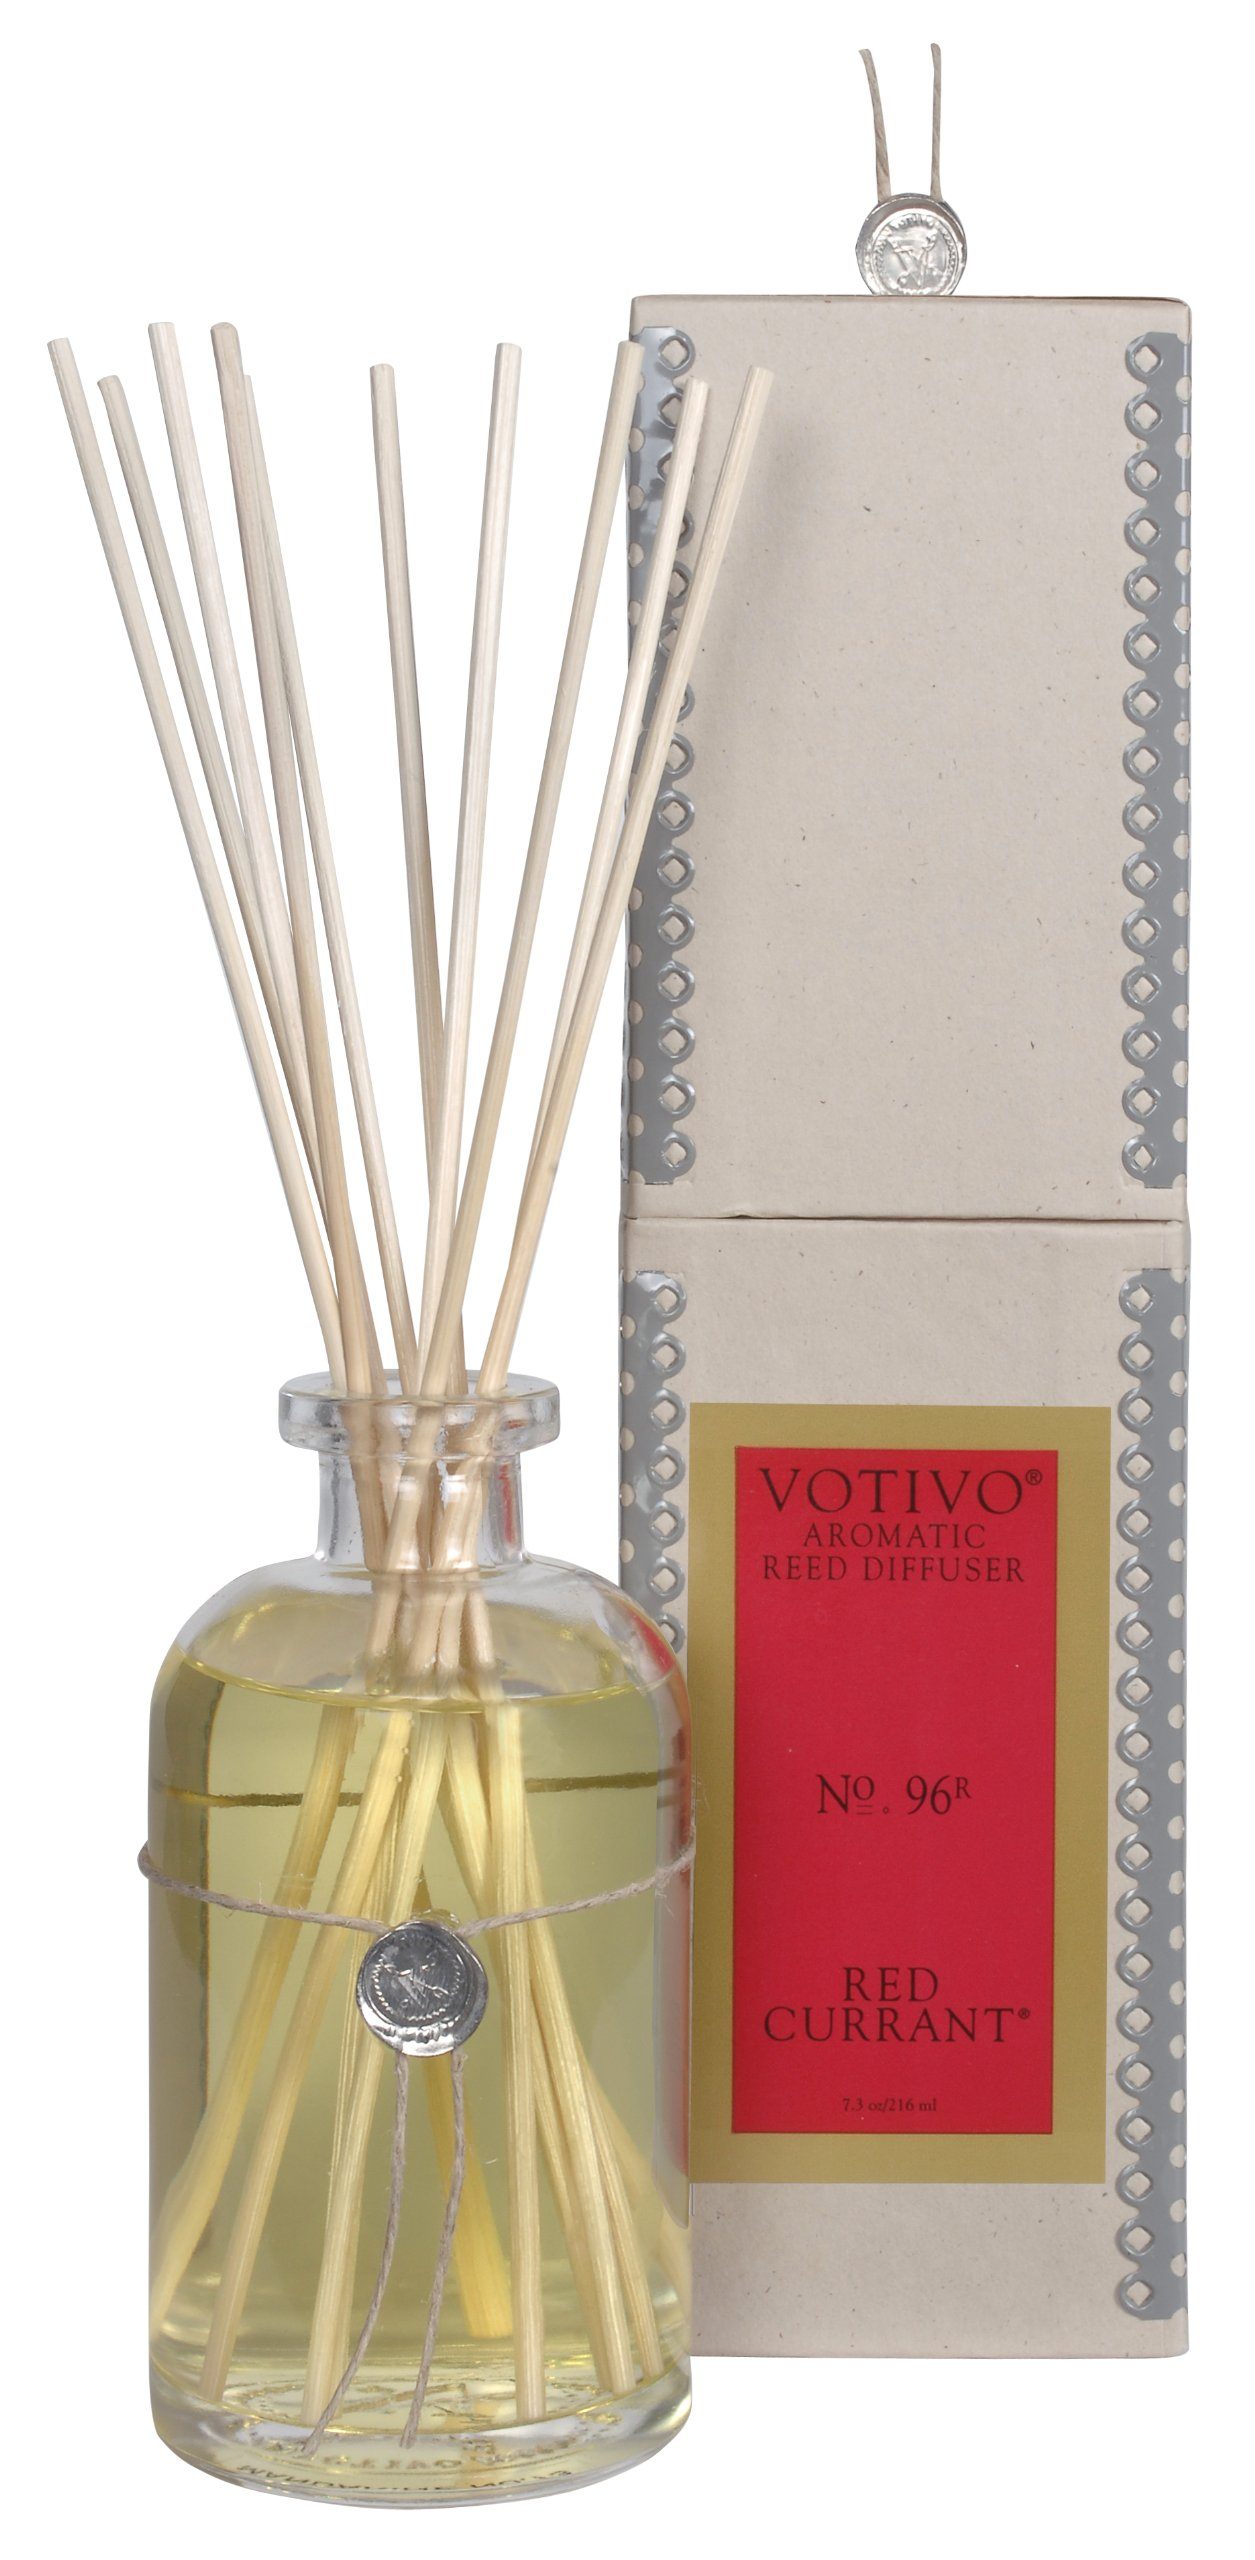 Votivo Aromatic Reed Diffuser, 7.3 fl. oz./216 ml, Red Currant by Votivo